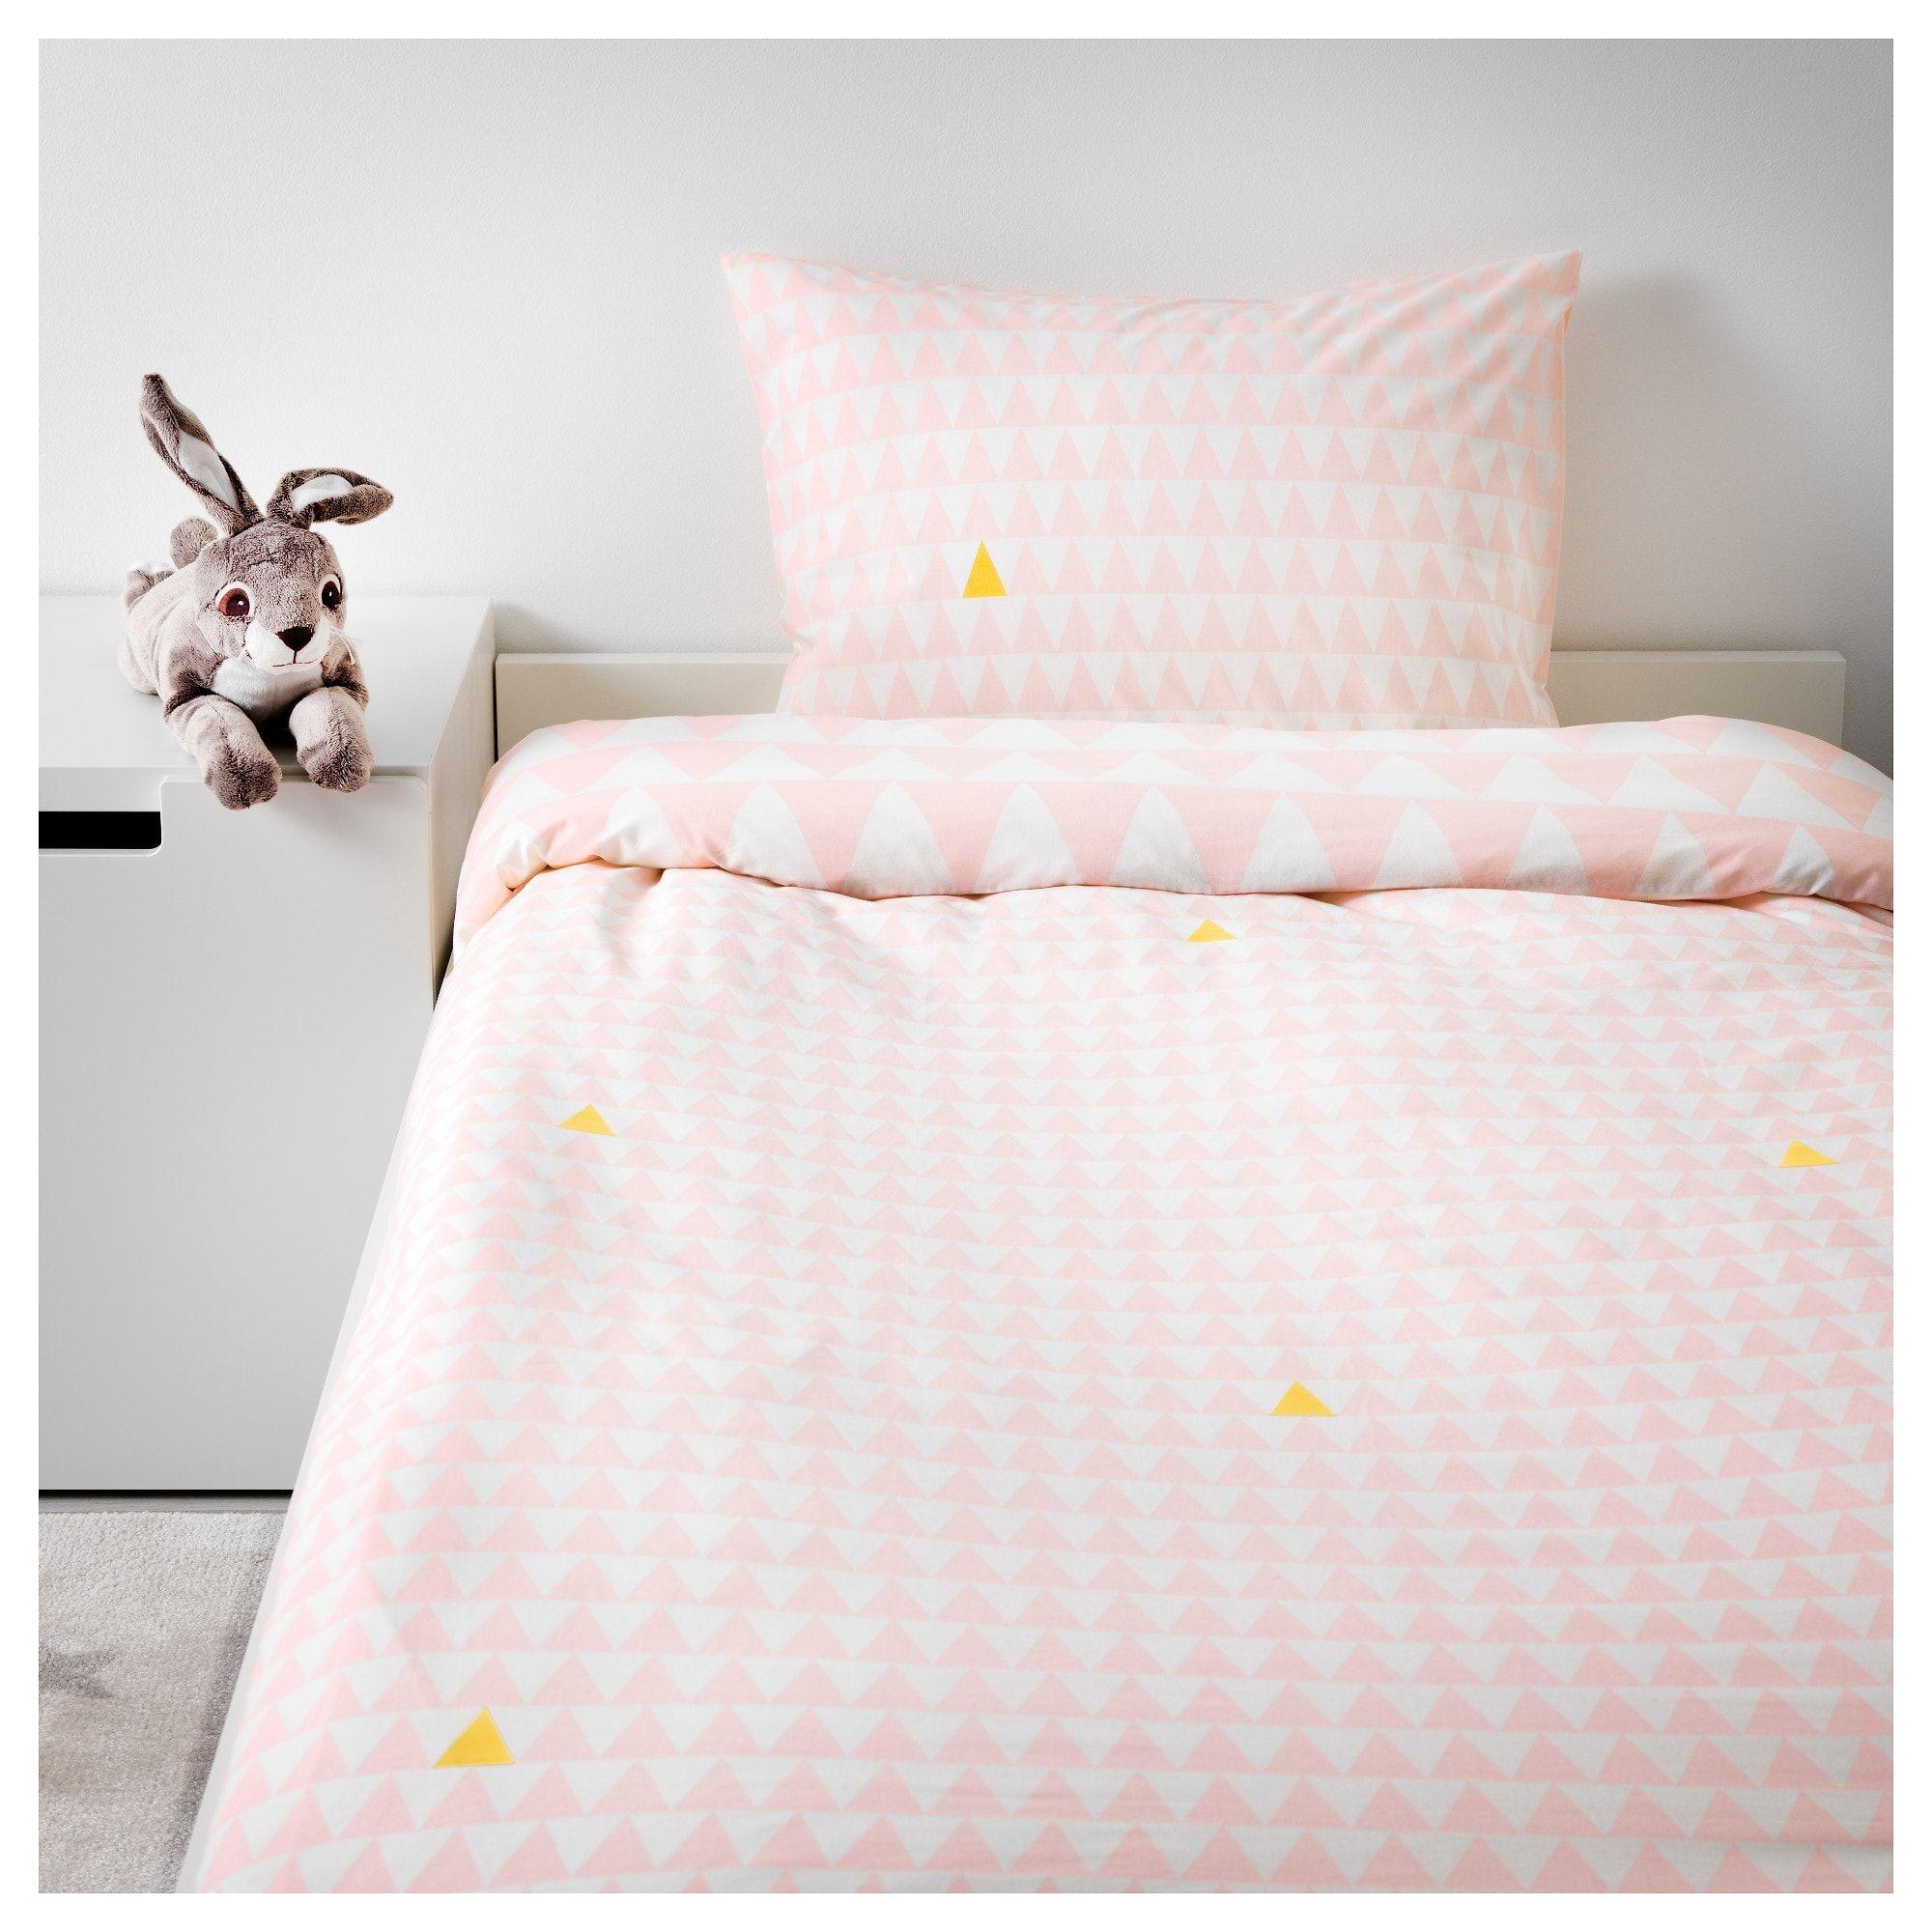 Ikea Stillsamt Light Pink Duvet Cover And Pillowcase S Light